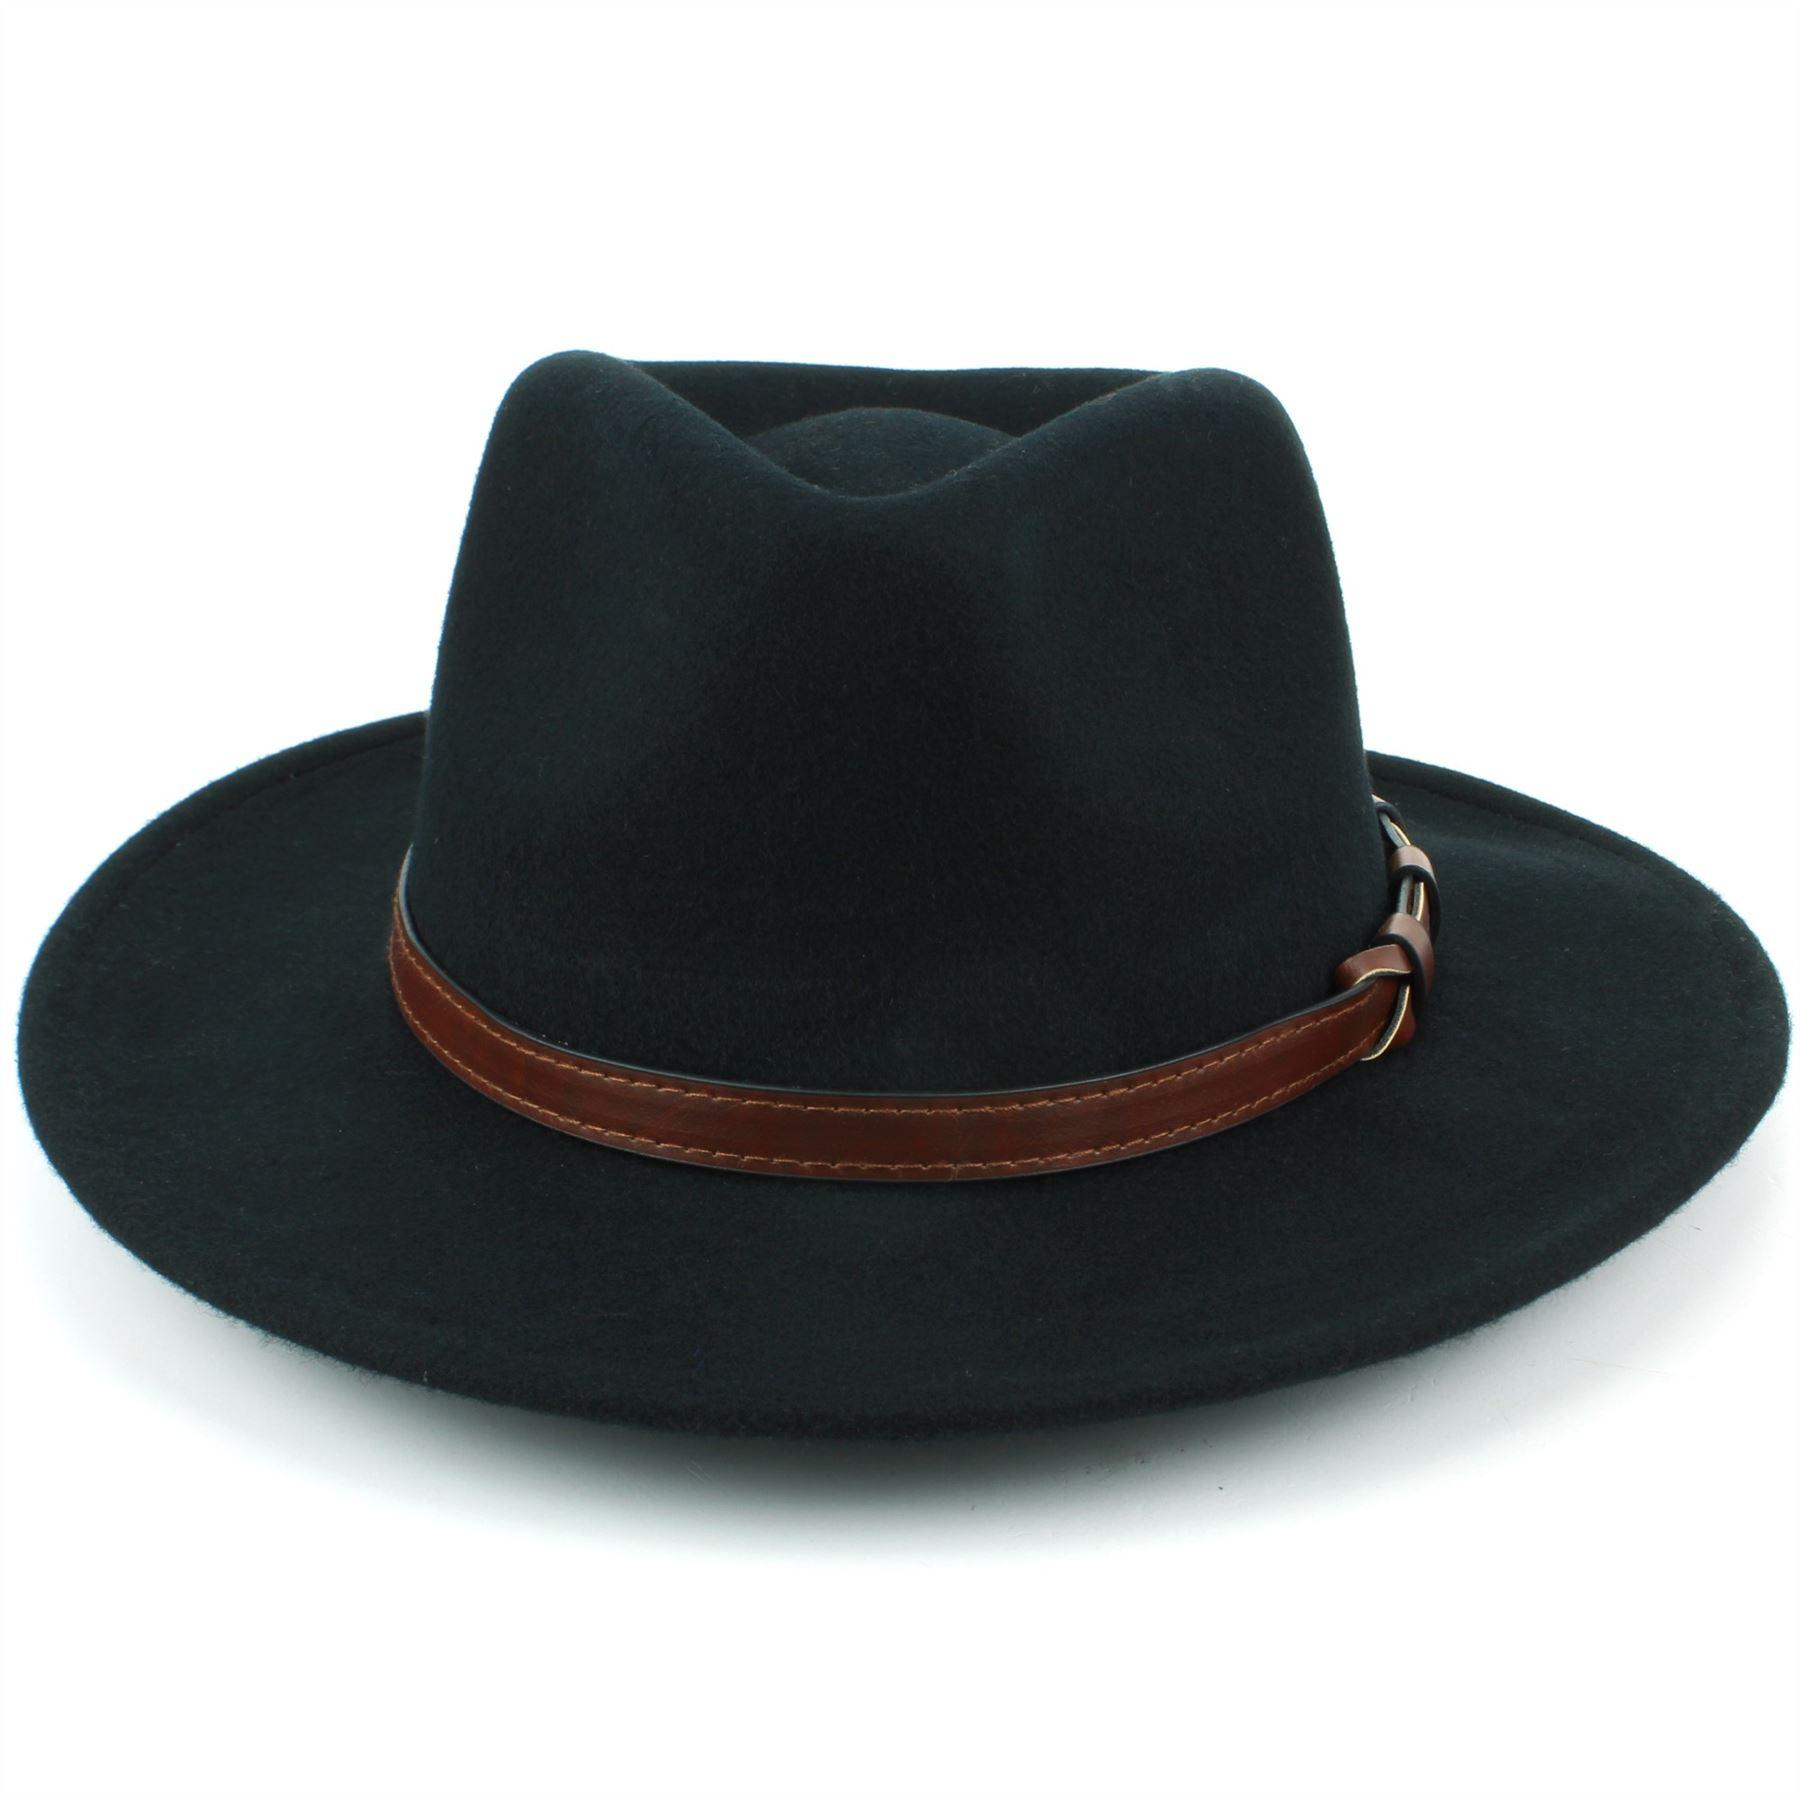 Fedora-Hat-Wool-BLACK-BROWN-Hawkins-Trilby-Brim-Mens-Ladies-Travel thumbnail 3